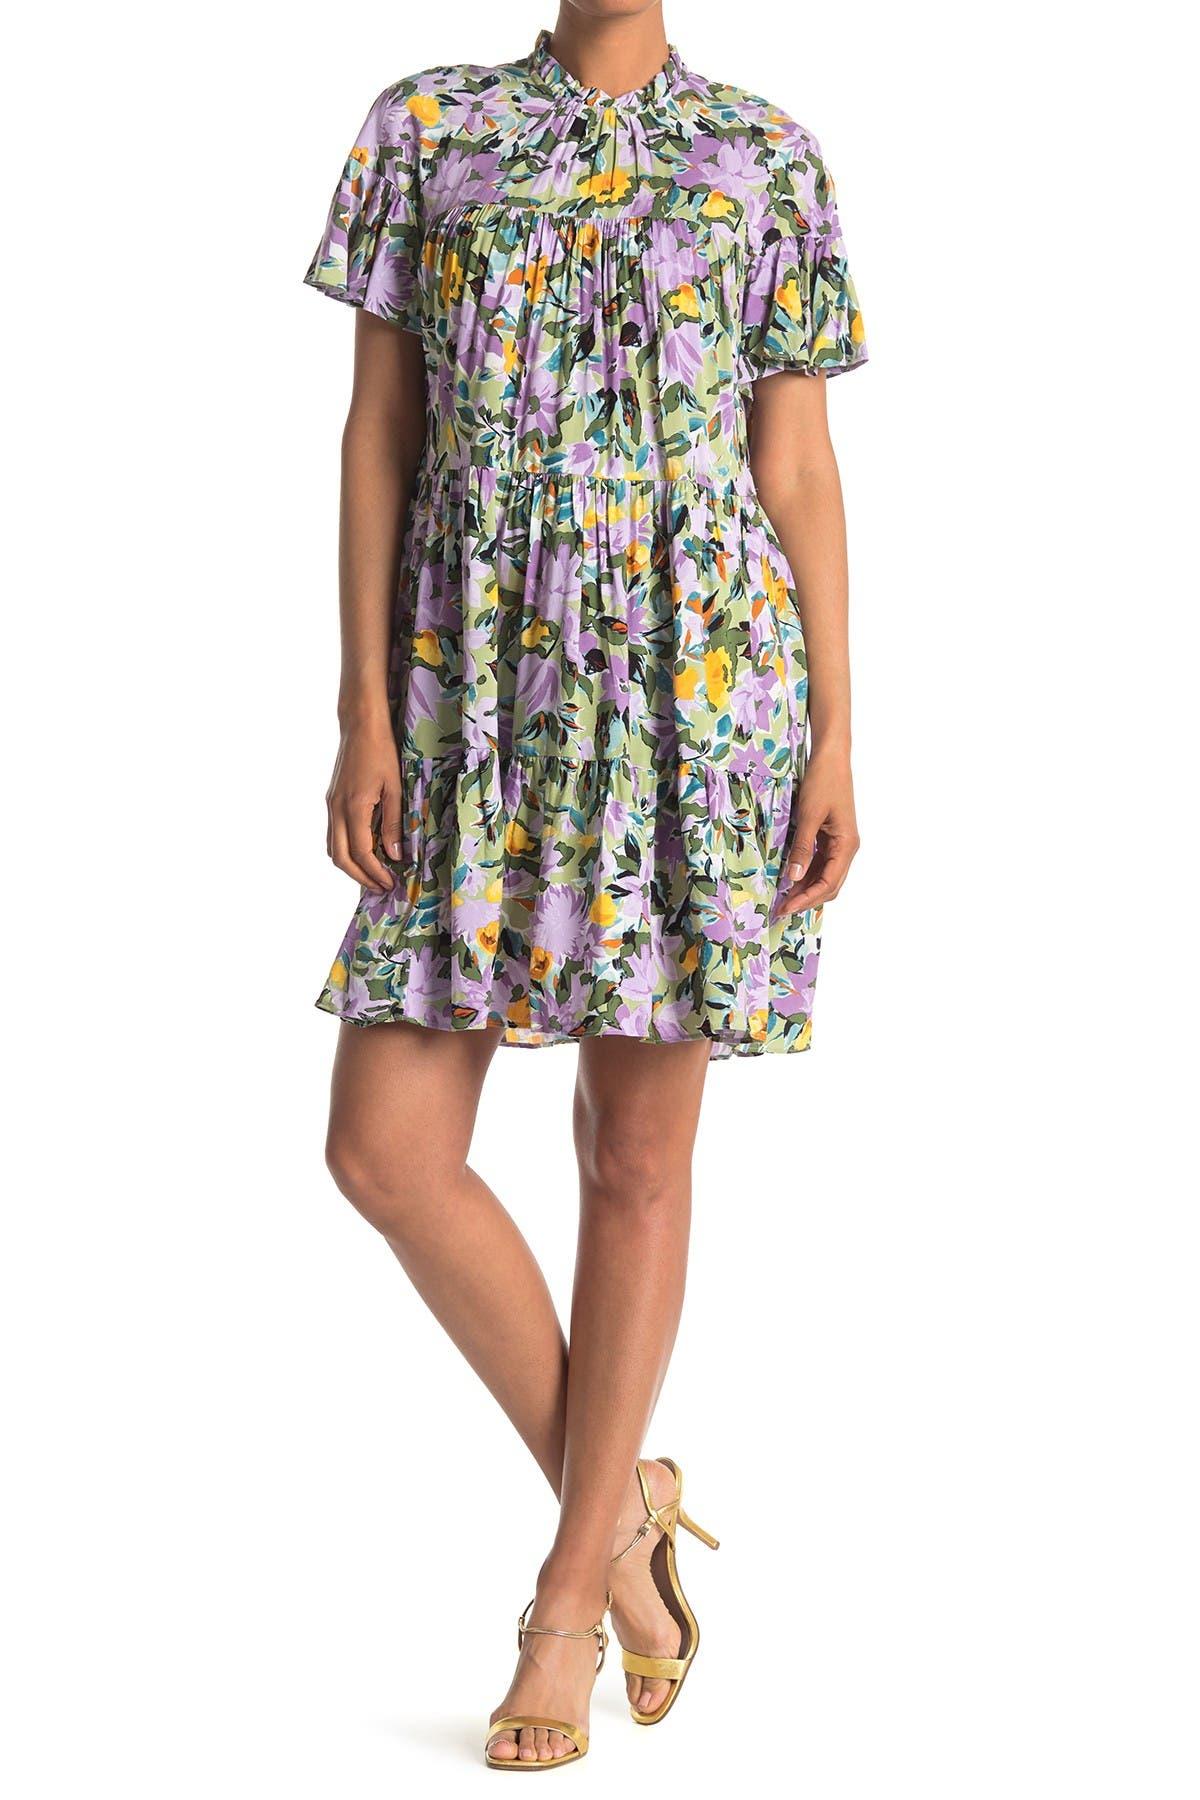 Image of Donna Morgan Loose Multi Tier High Neck Dress